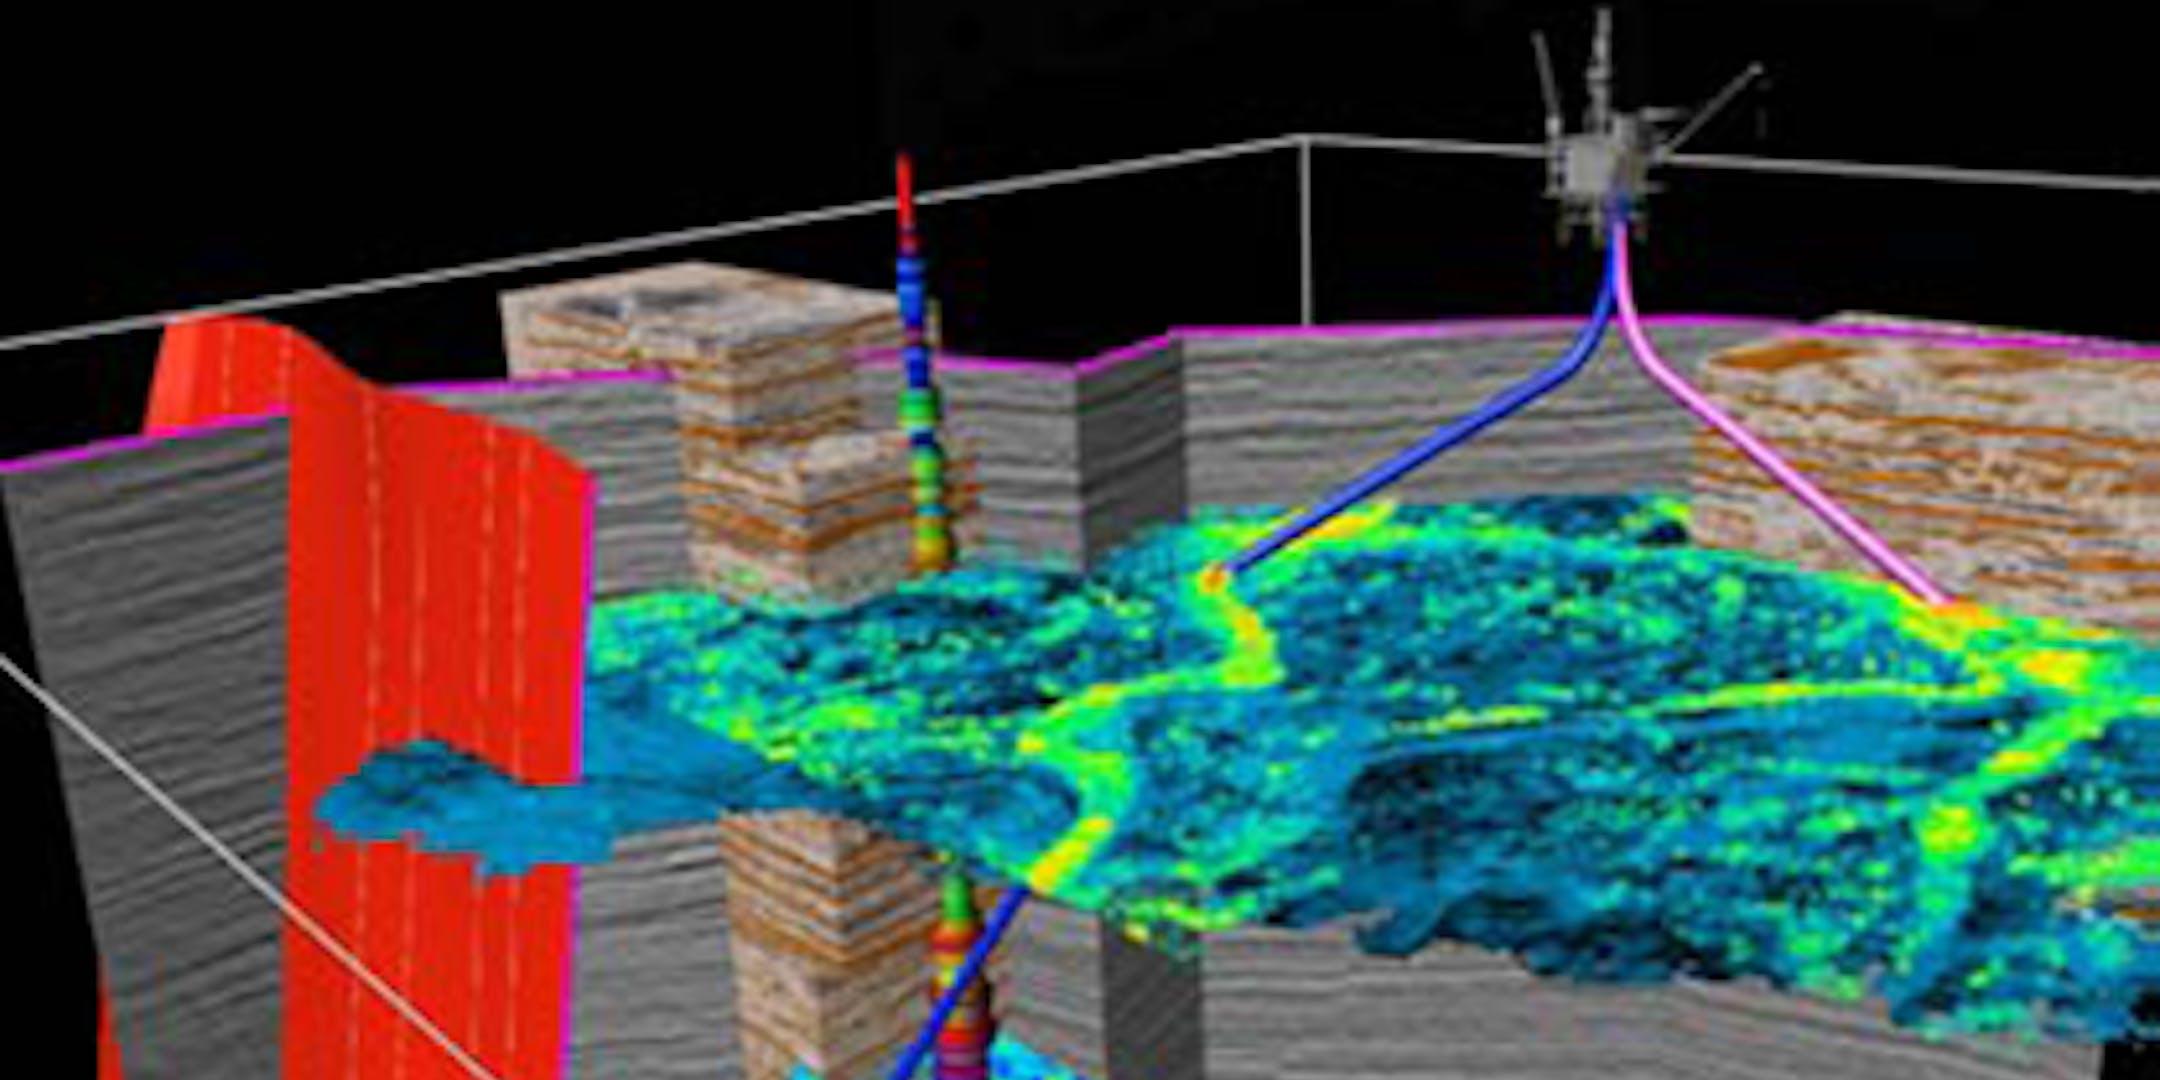 Atributos Sismicos 3D / 3D Seismic Attributes